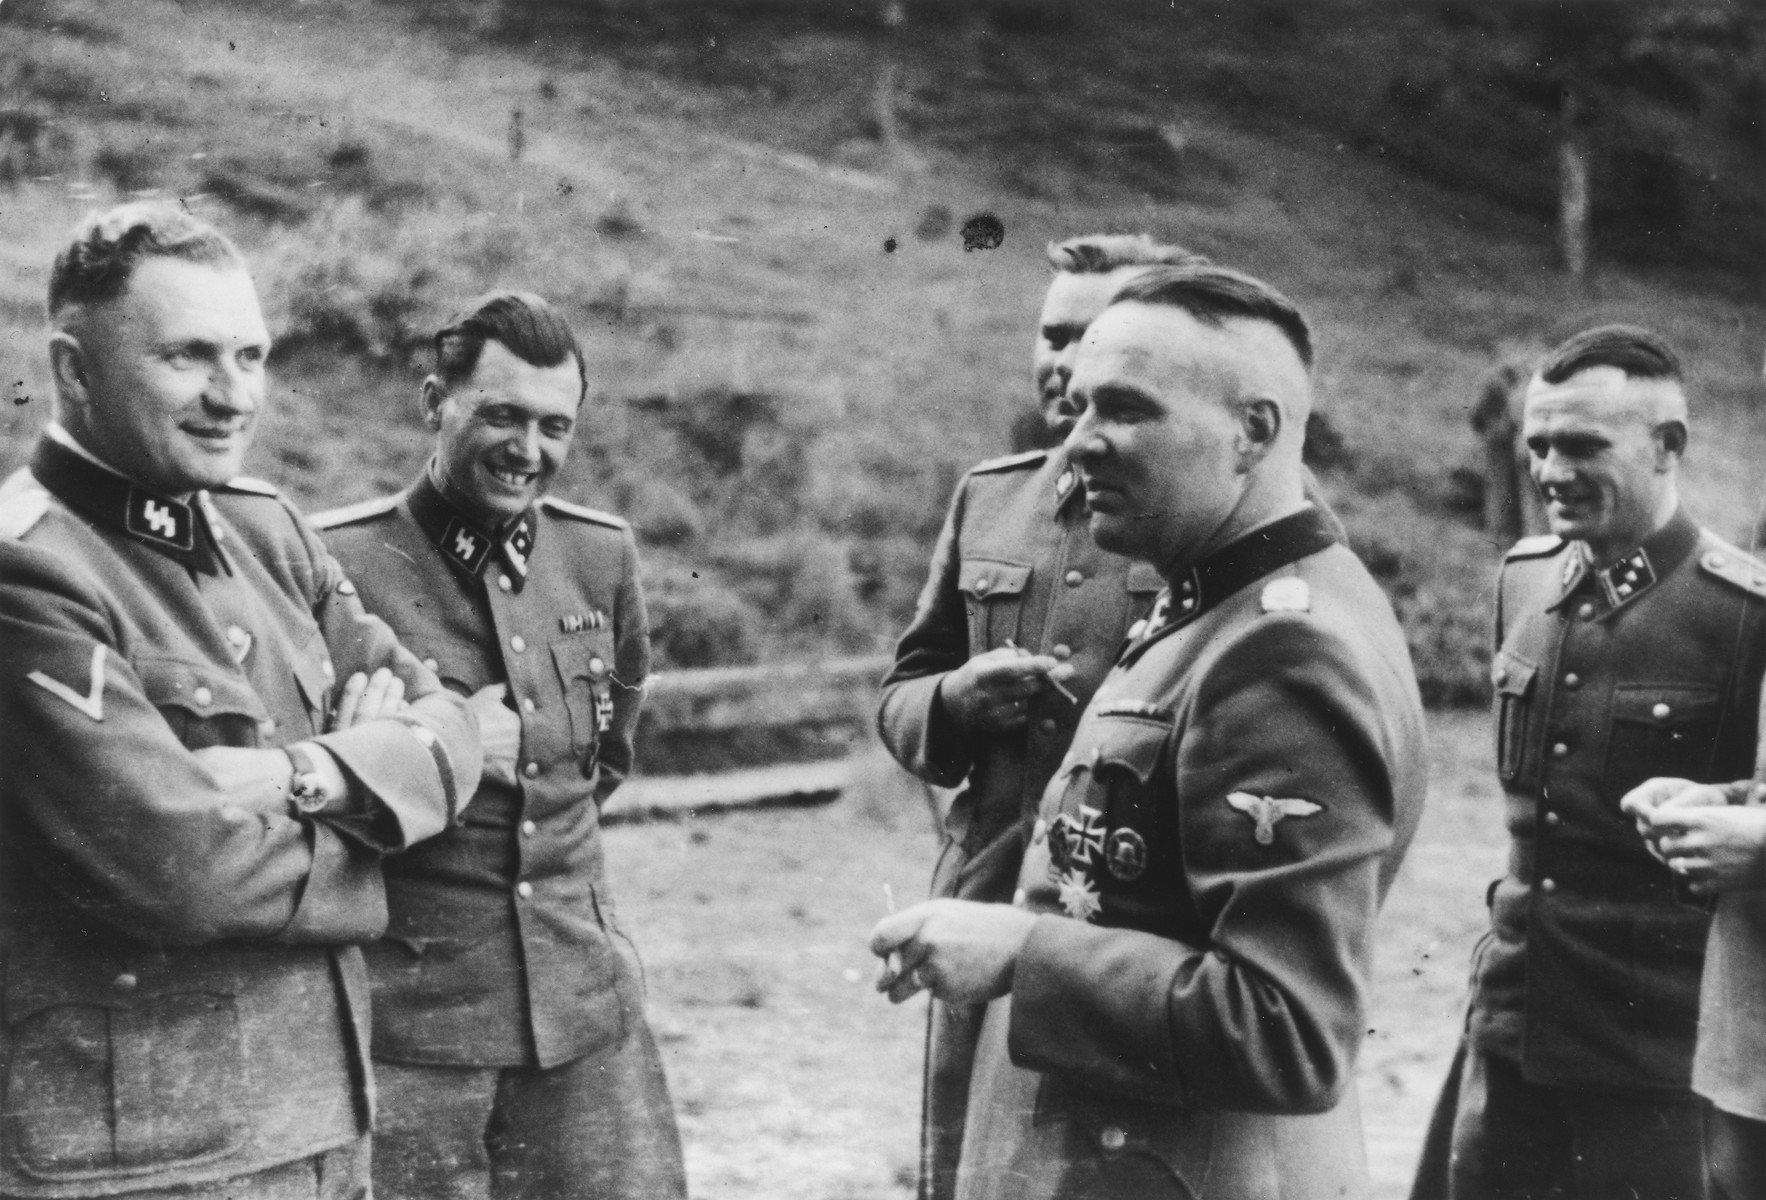 Oficiales de la SS: Richard Baer, Josef Mengele, Josef Kramer, Rudolf Hoess y Anton Thumann